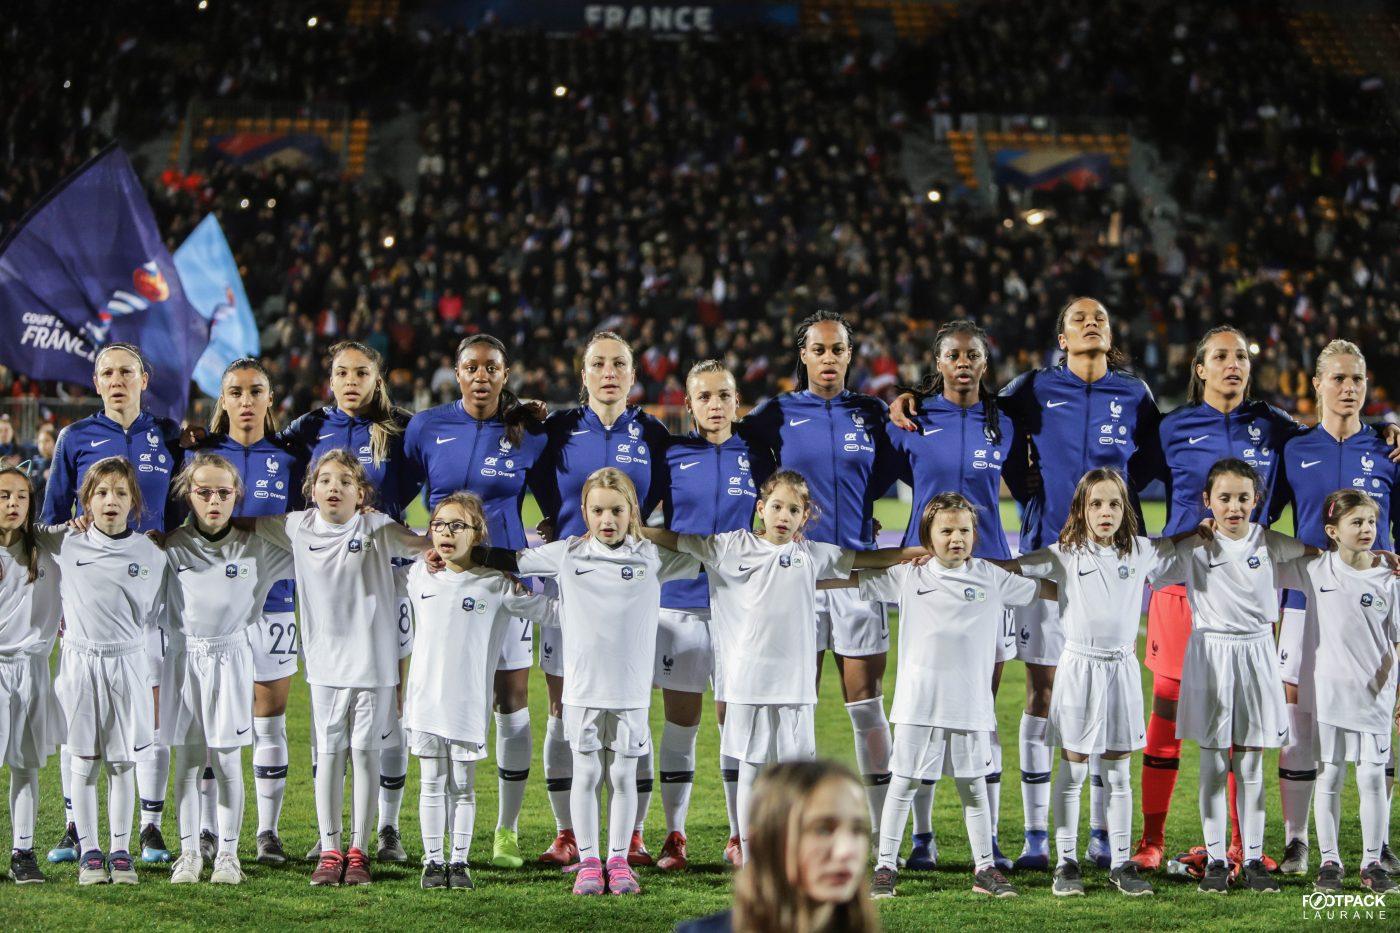 equipe-de-france-feminine-coupe-du-monde-2019-france-allemagne-a